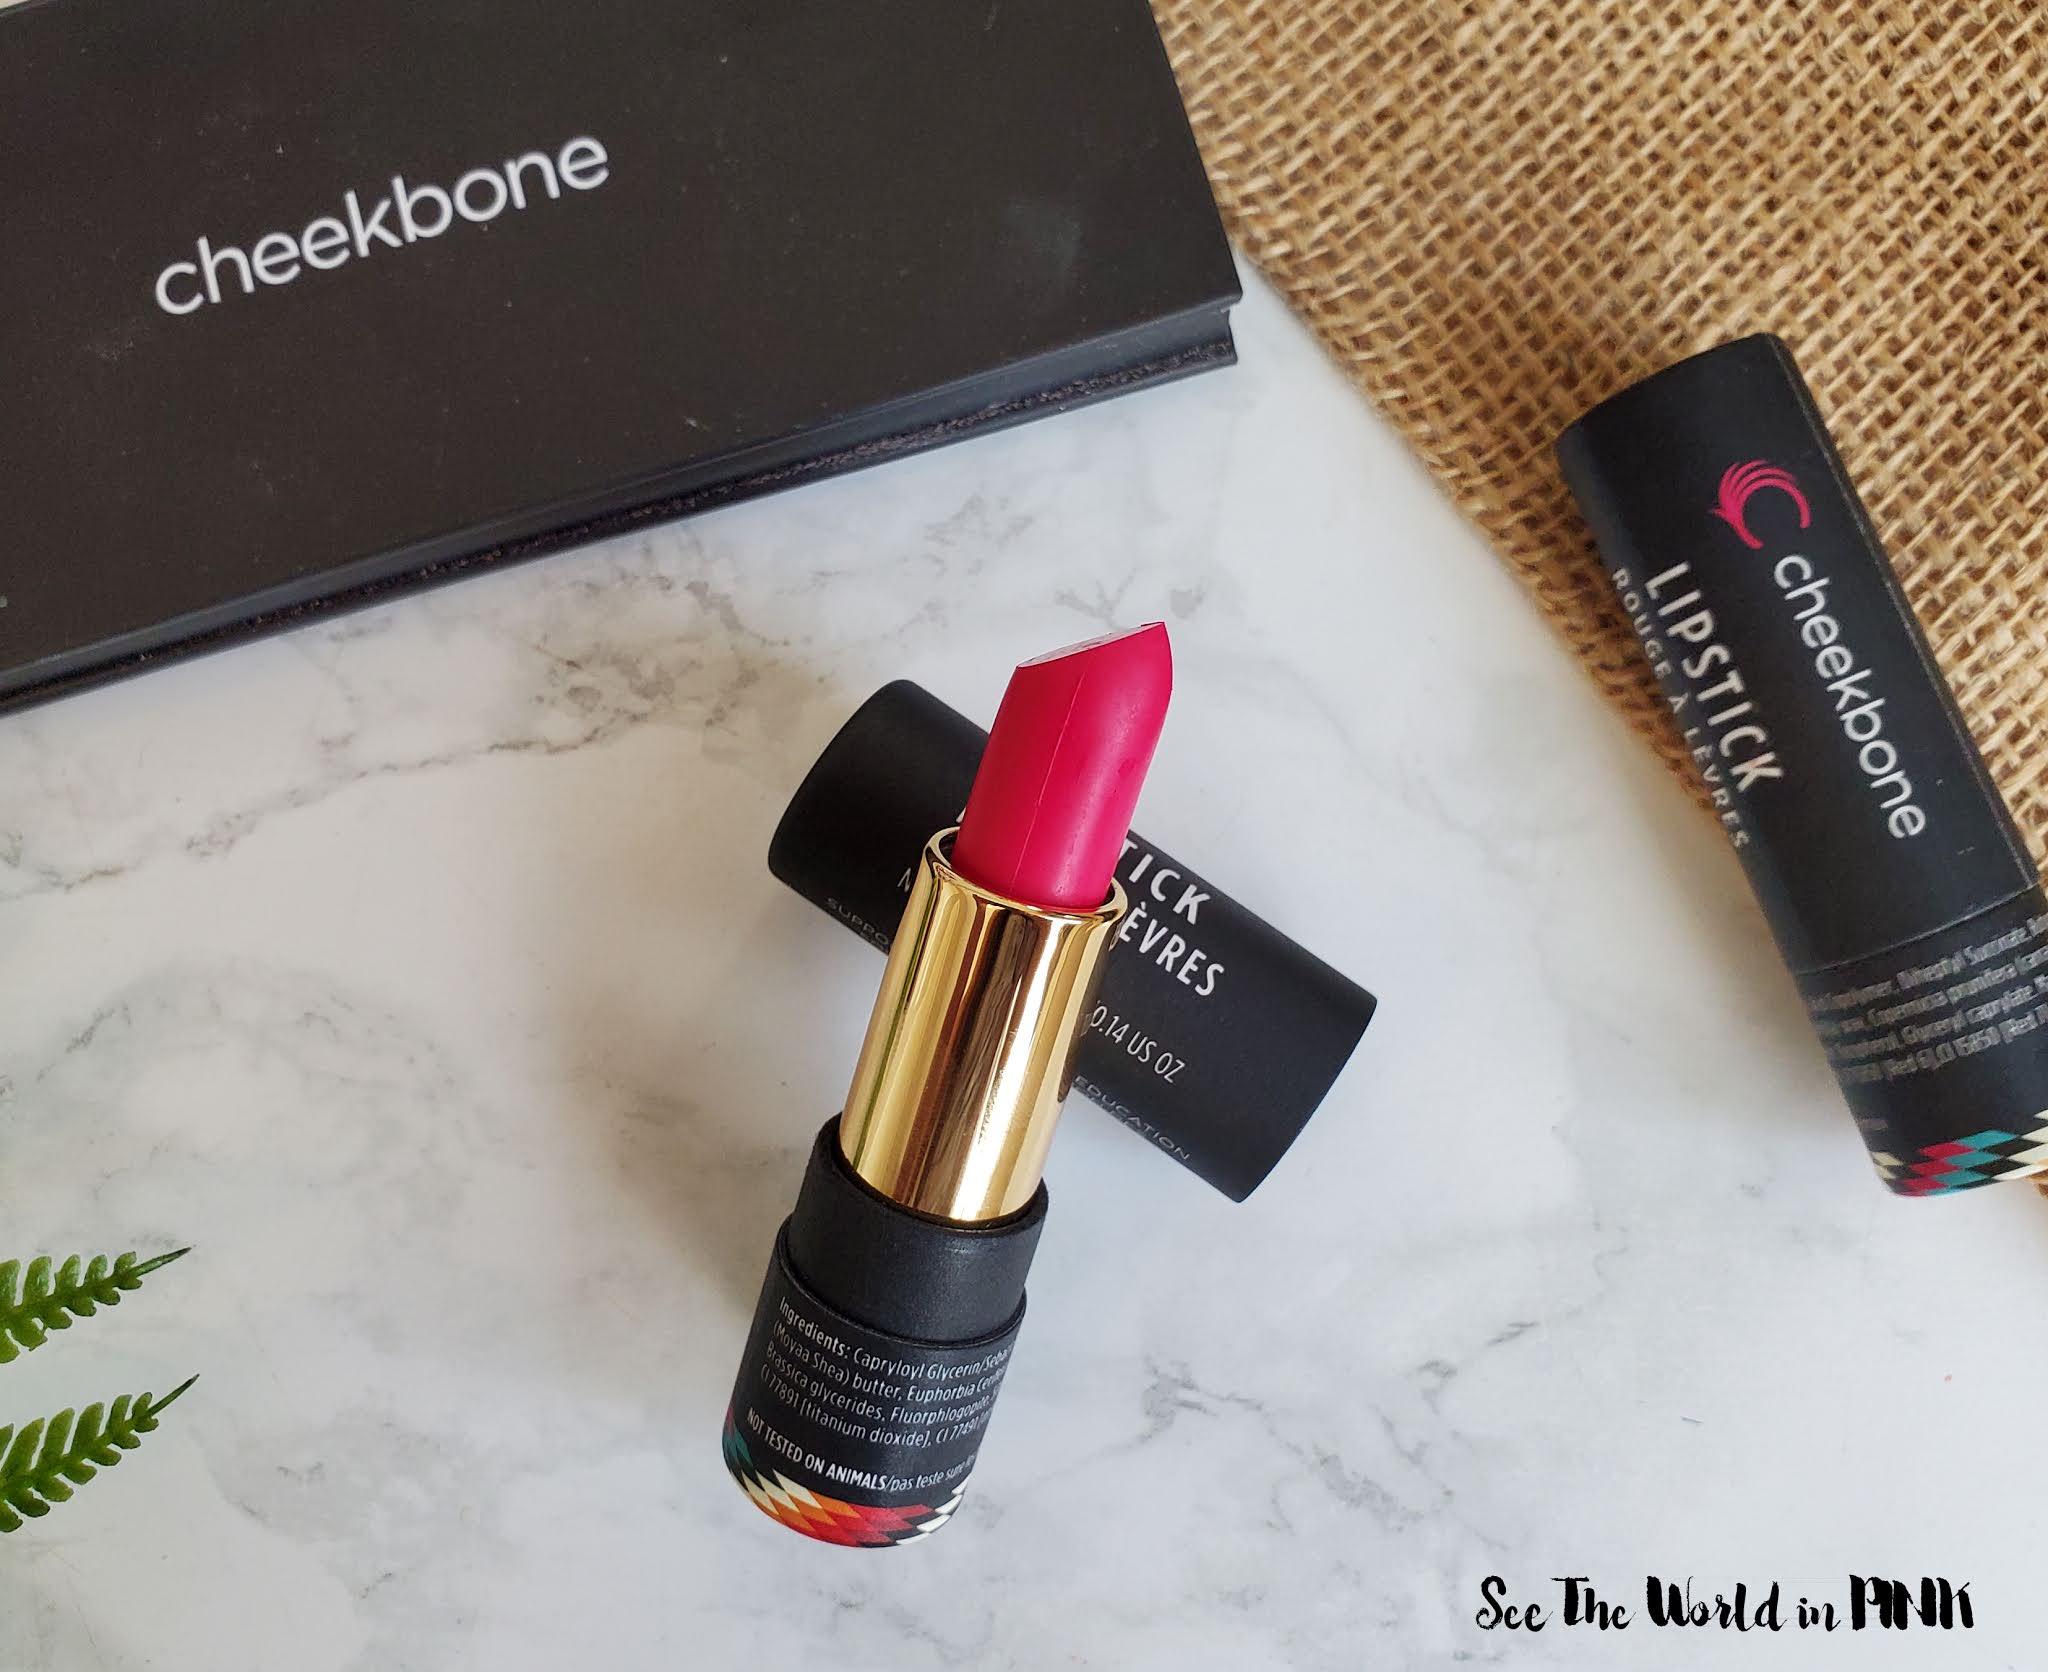 New Cheekbone Beauty Sustain Lipsticks in Haki & Aina